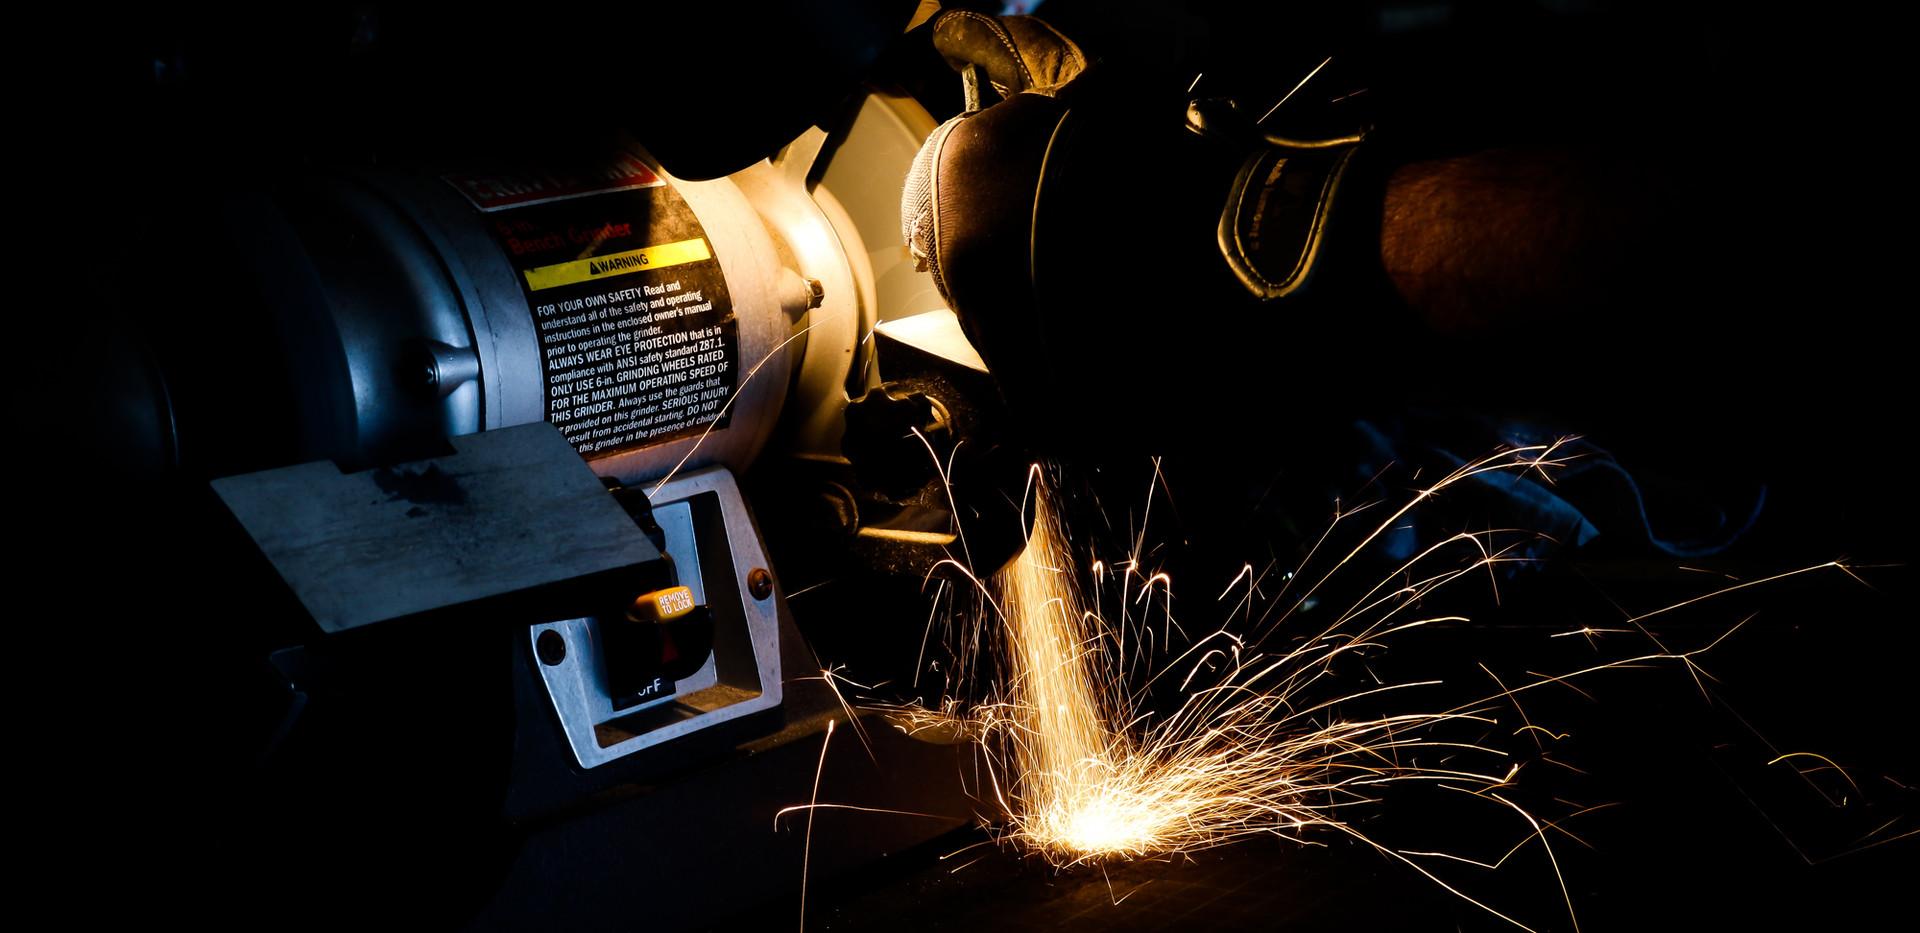 Welding, Machine Work, Sandblasting